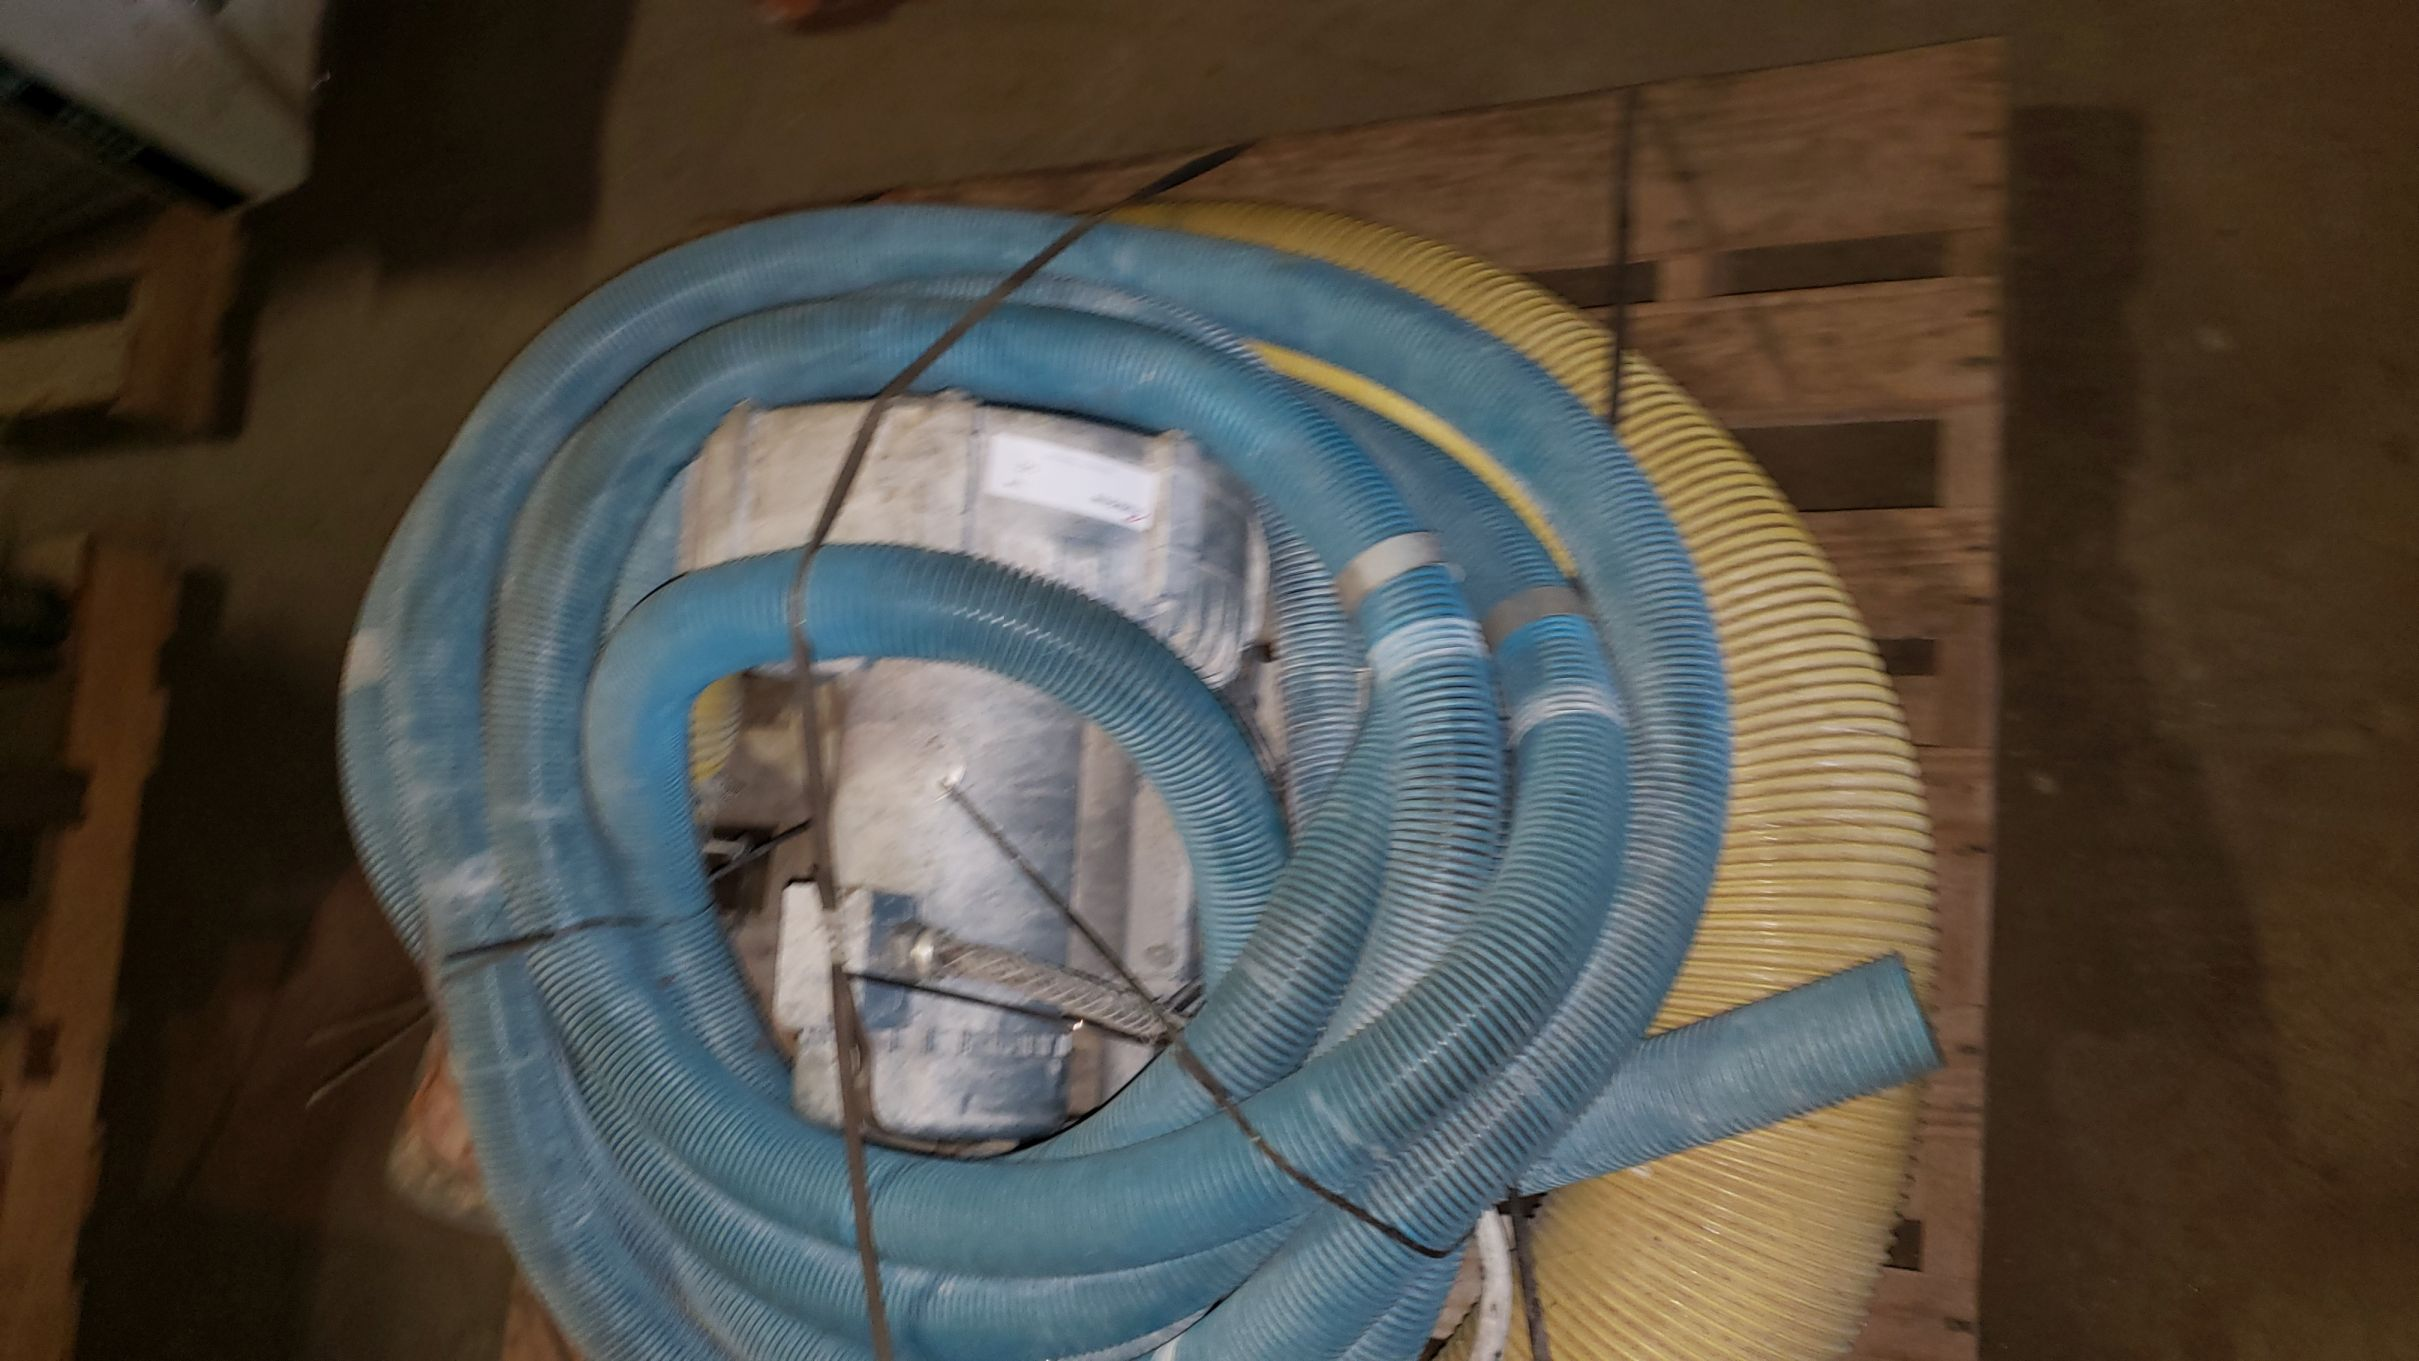 Lot 142 - Vacuum Loader with pump